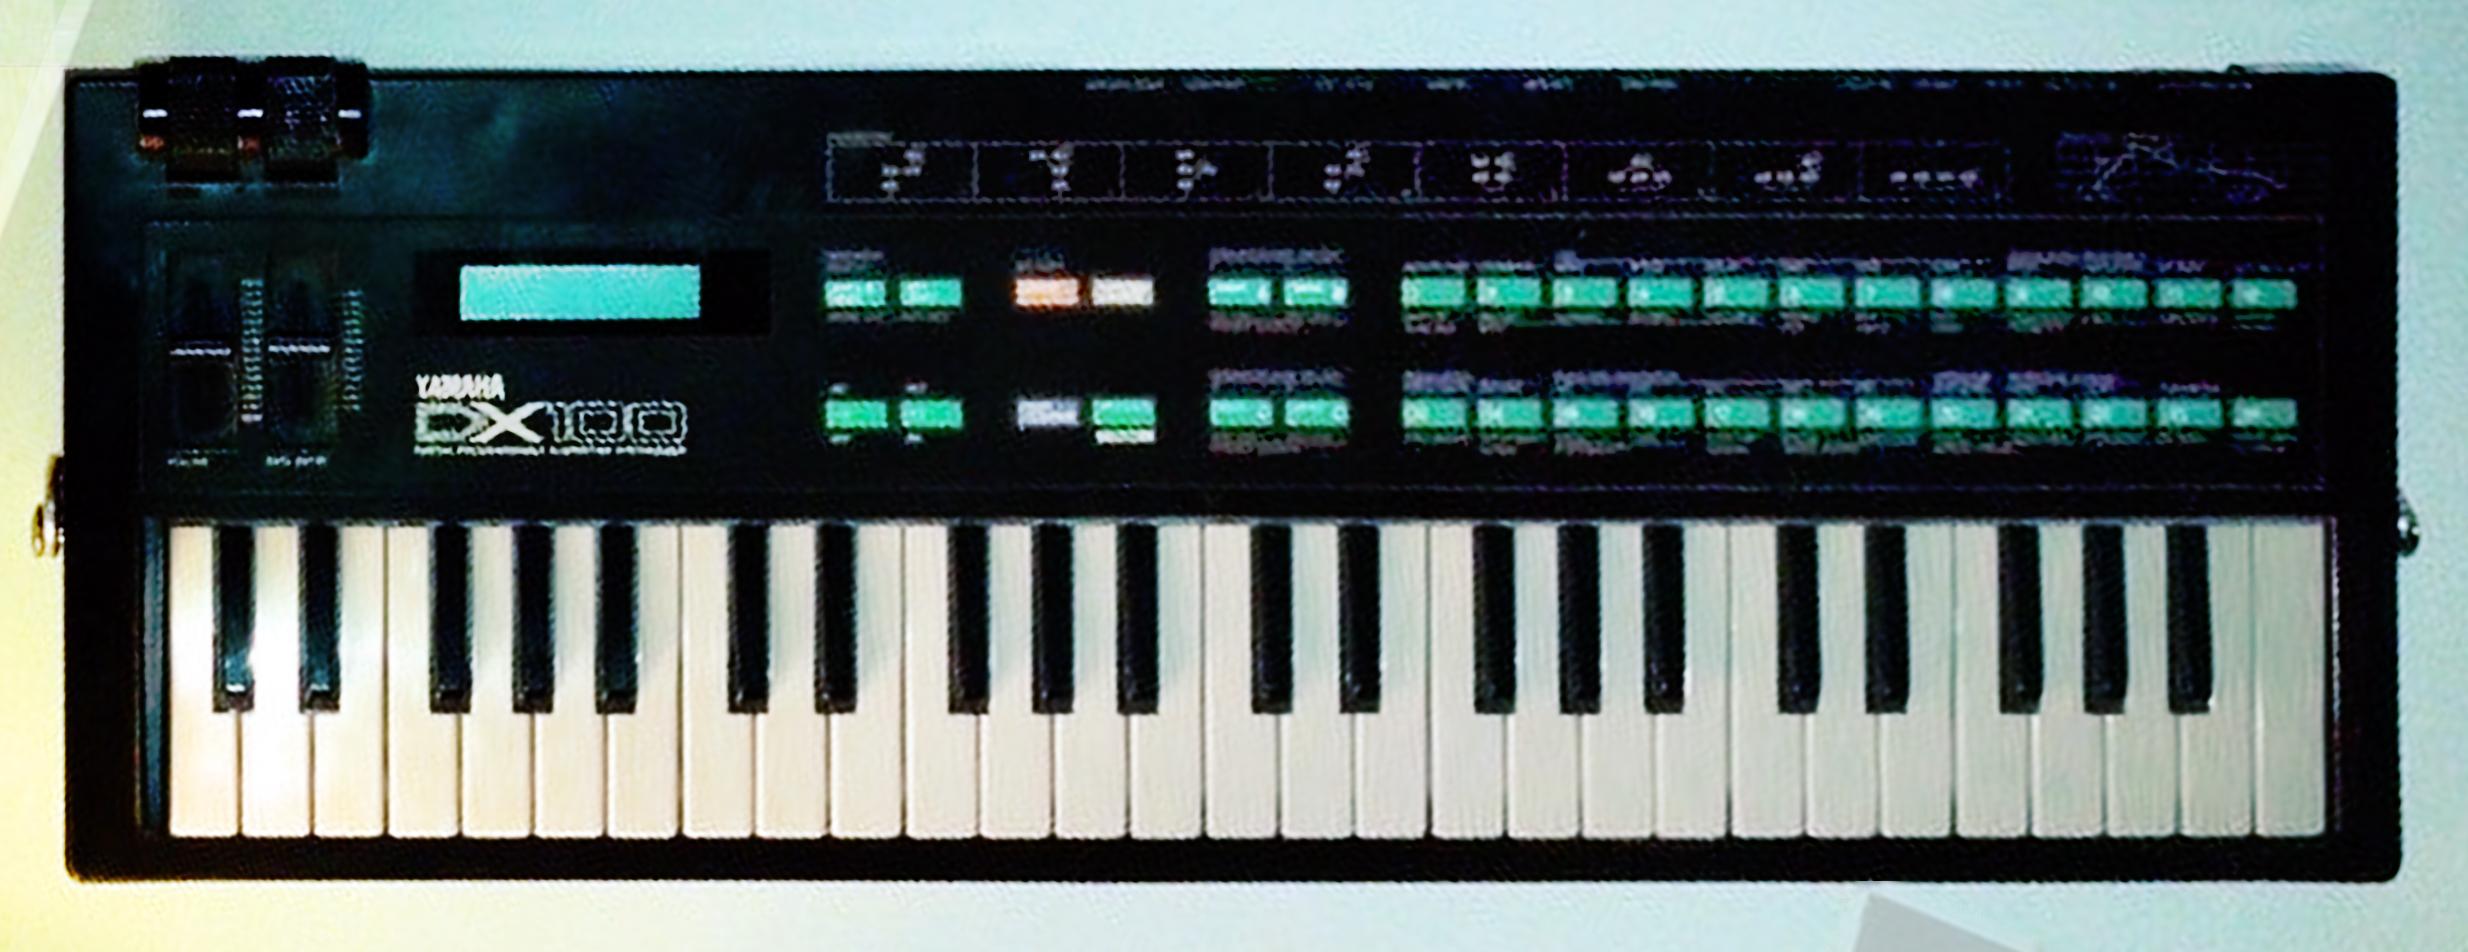 Image Result For Yamaha Keyboard Wikipedia